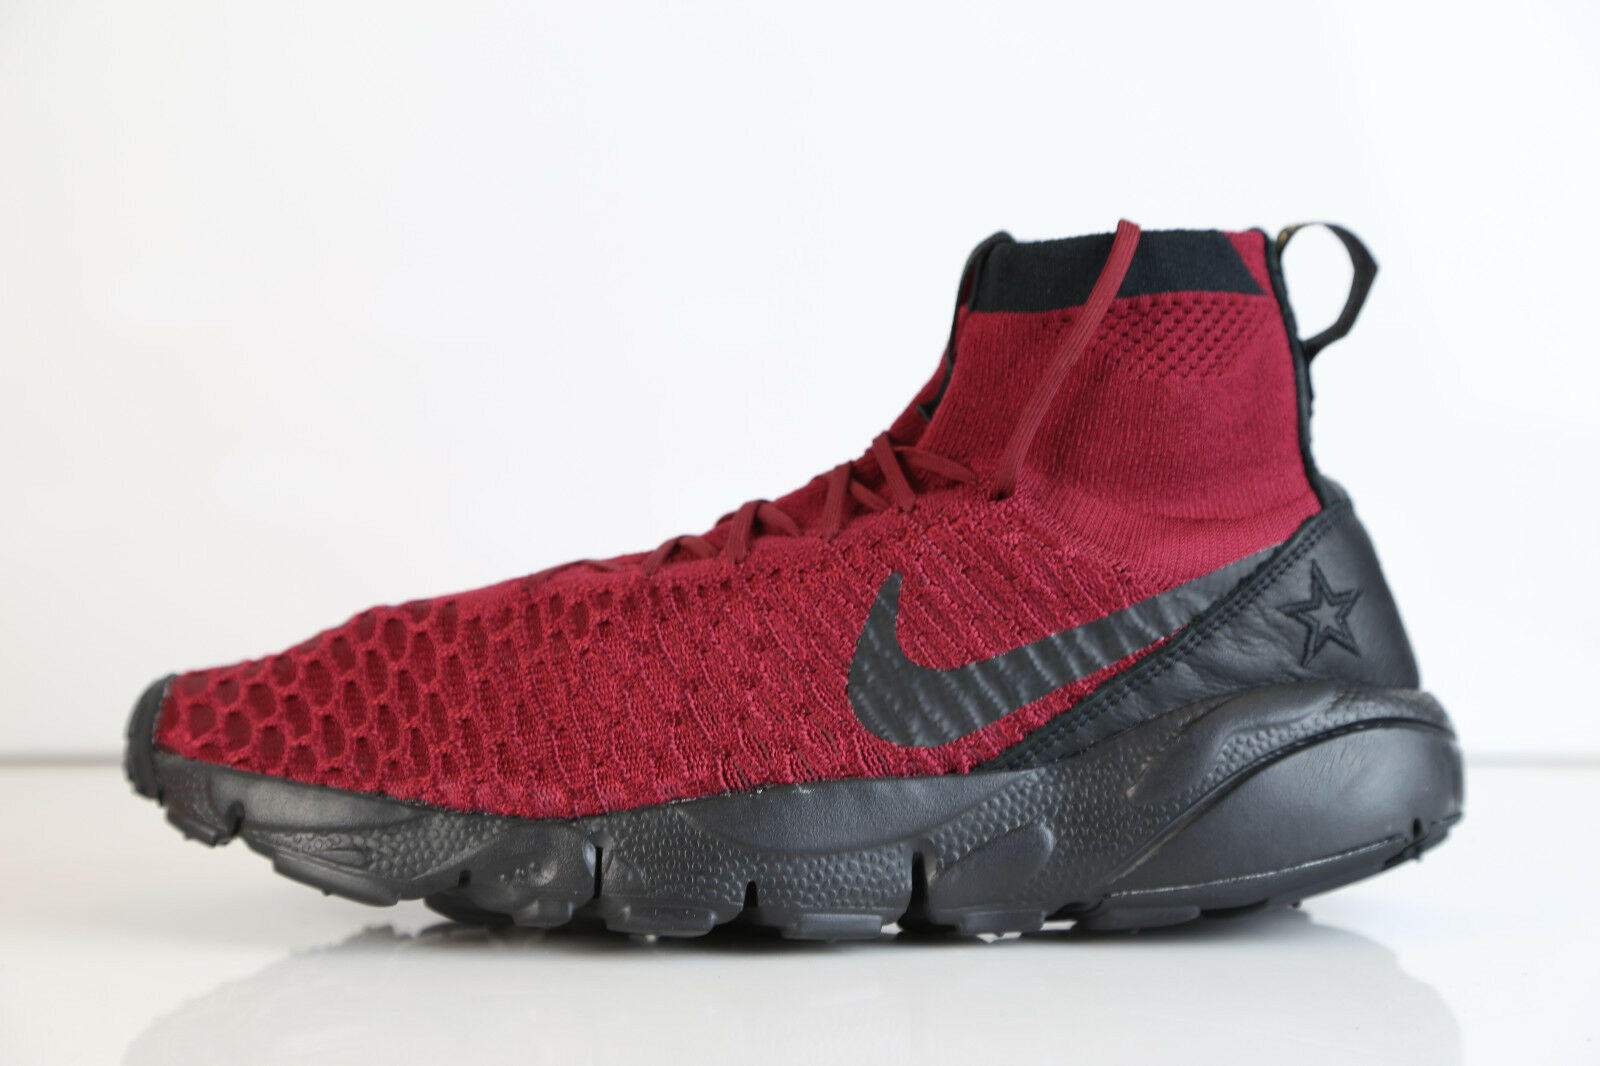 Nike Air Footscape Magista FK FC Team Red Black 830600-600 8-12 free 1